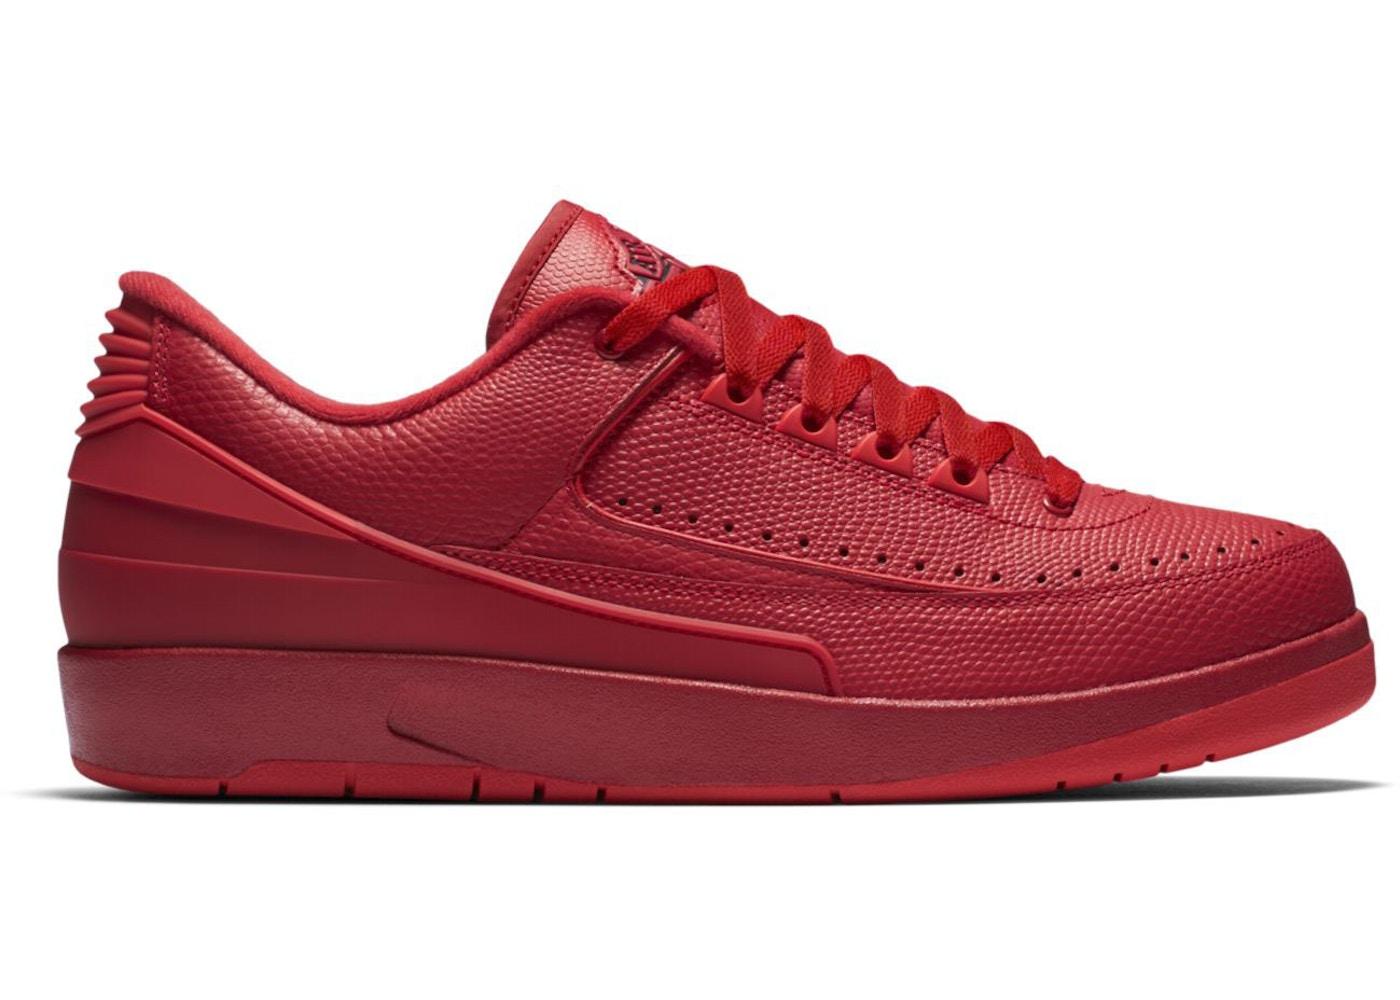 83db74be28d Buy Air Jordan 2 Shoes & Deadstock Sneakers